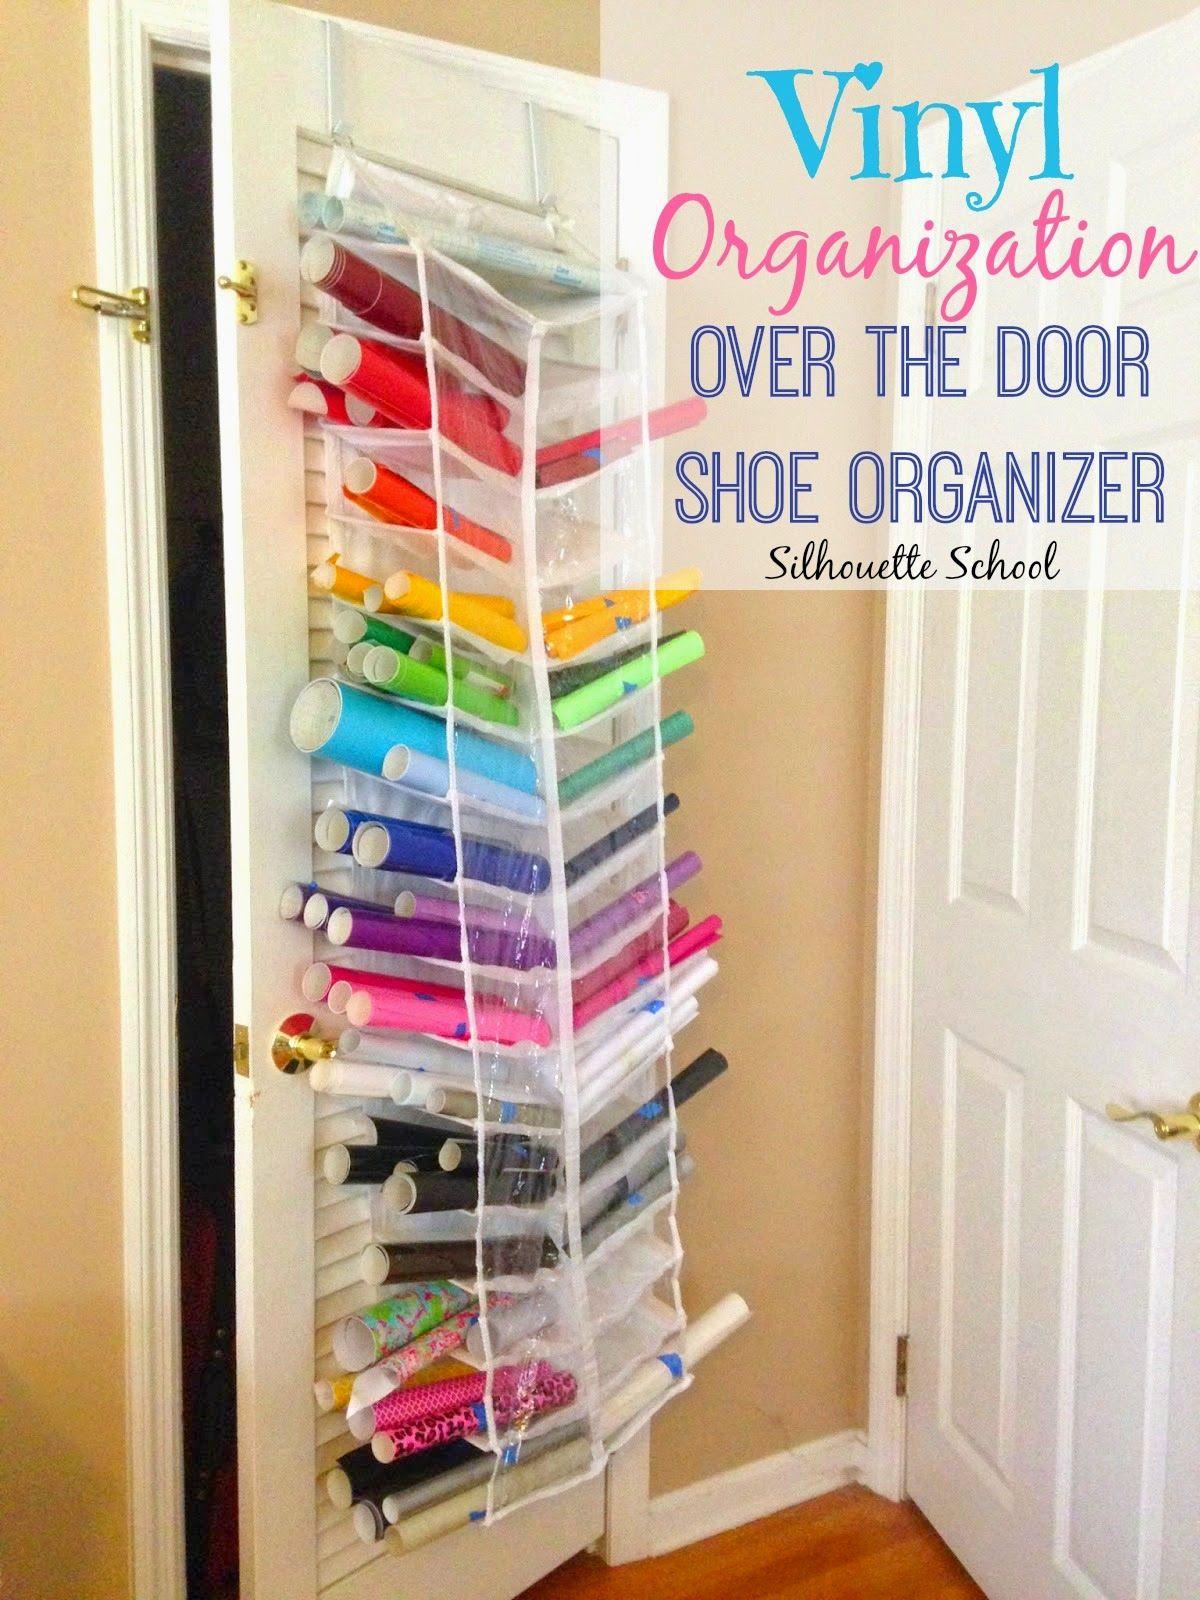 Htv And Vinyl Storage In An Over The Door Shoe Organizer